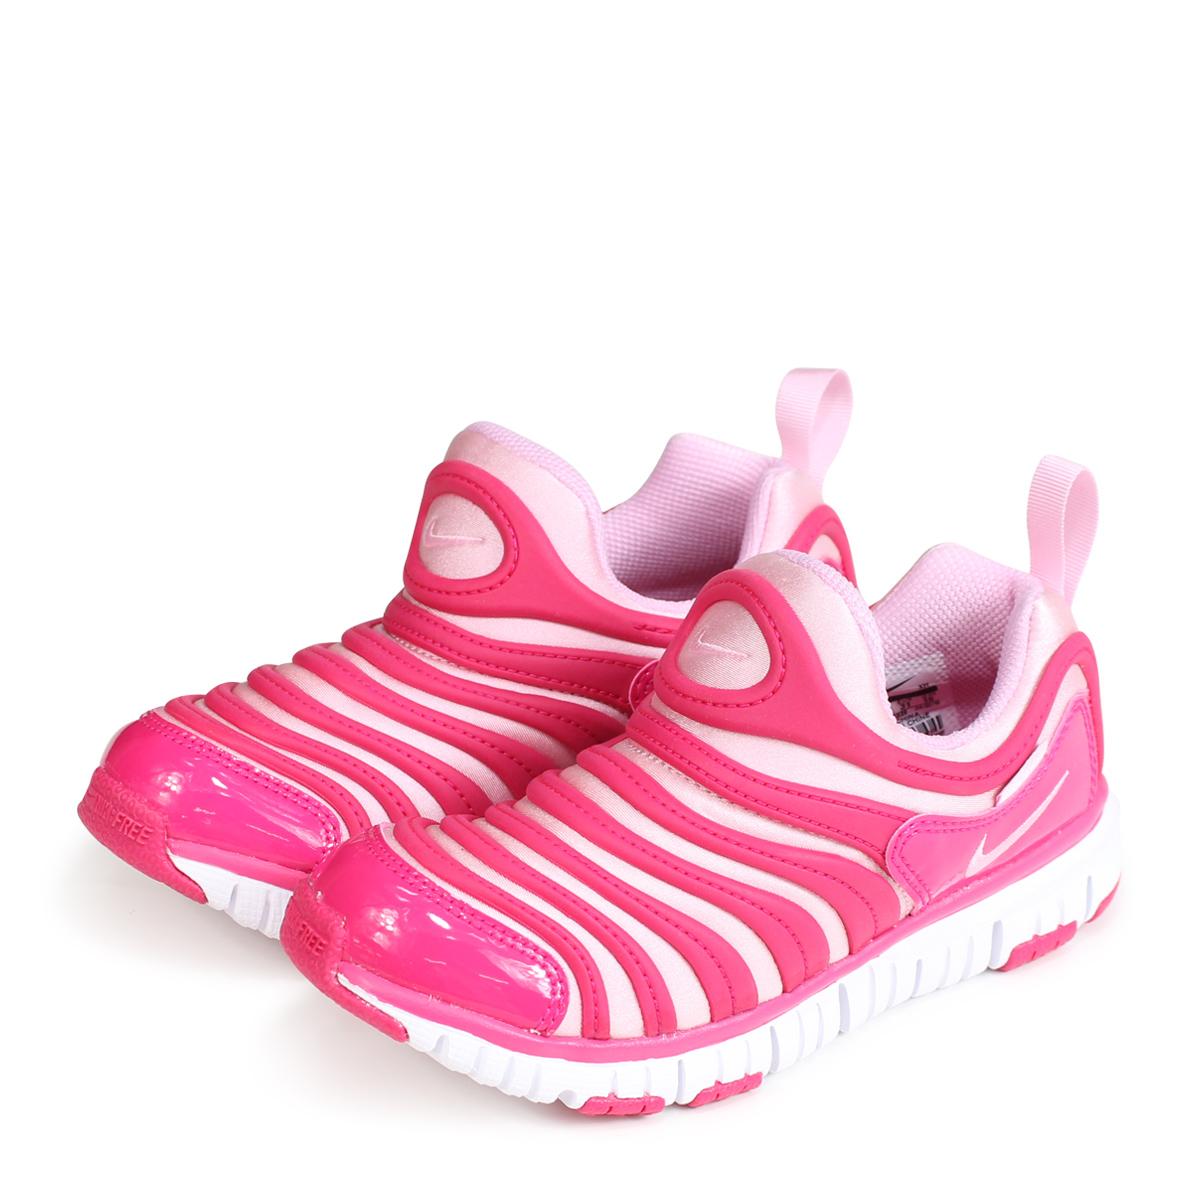 new concept 92d9b 5ea3c NIKE DYNAMO FREE PS Nike dynamo-free kids sneakers 343,738-626 pink  load  ...